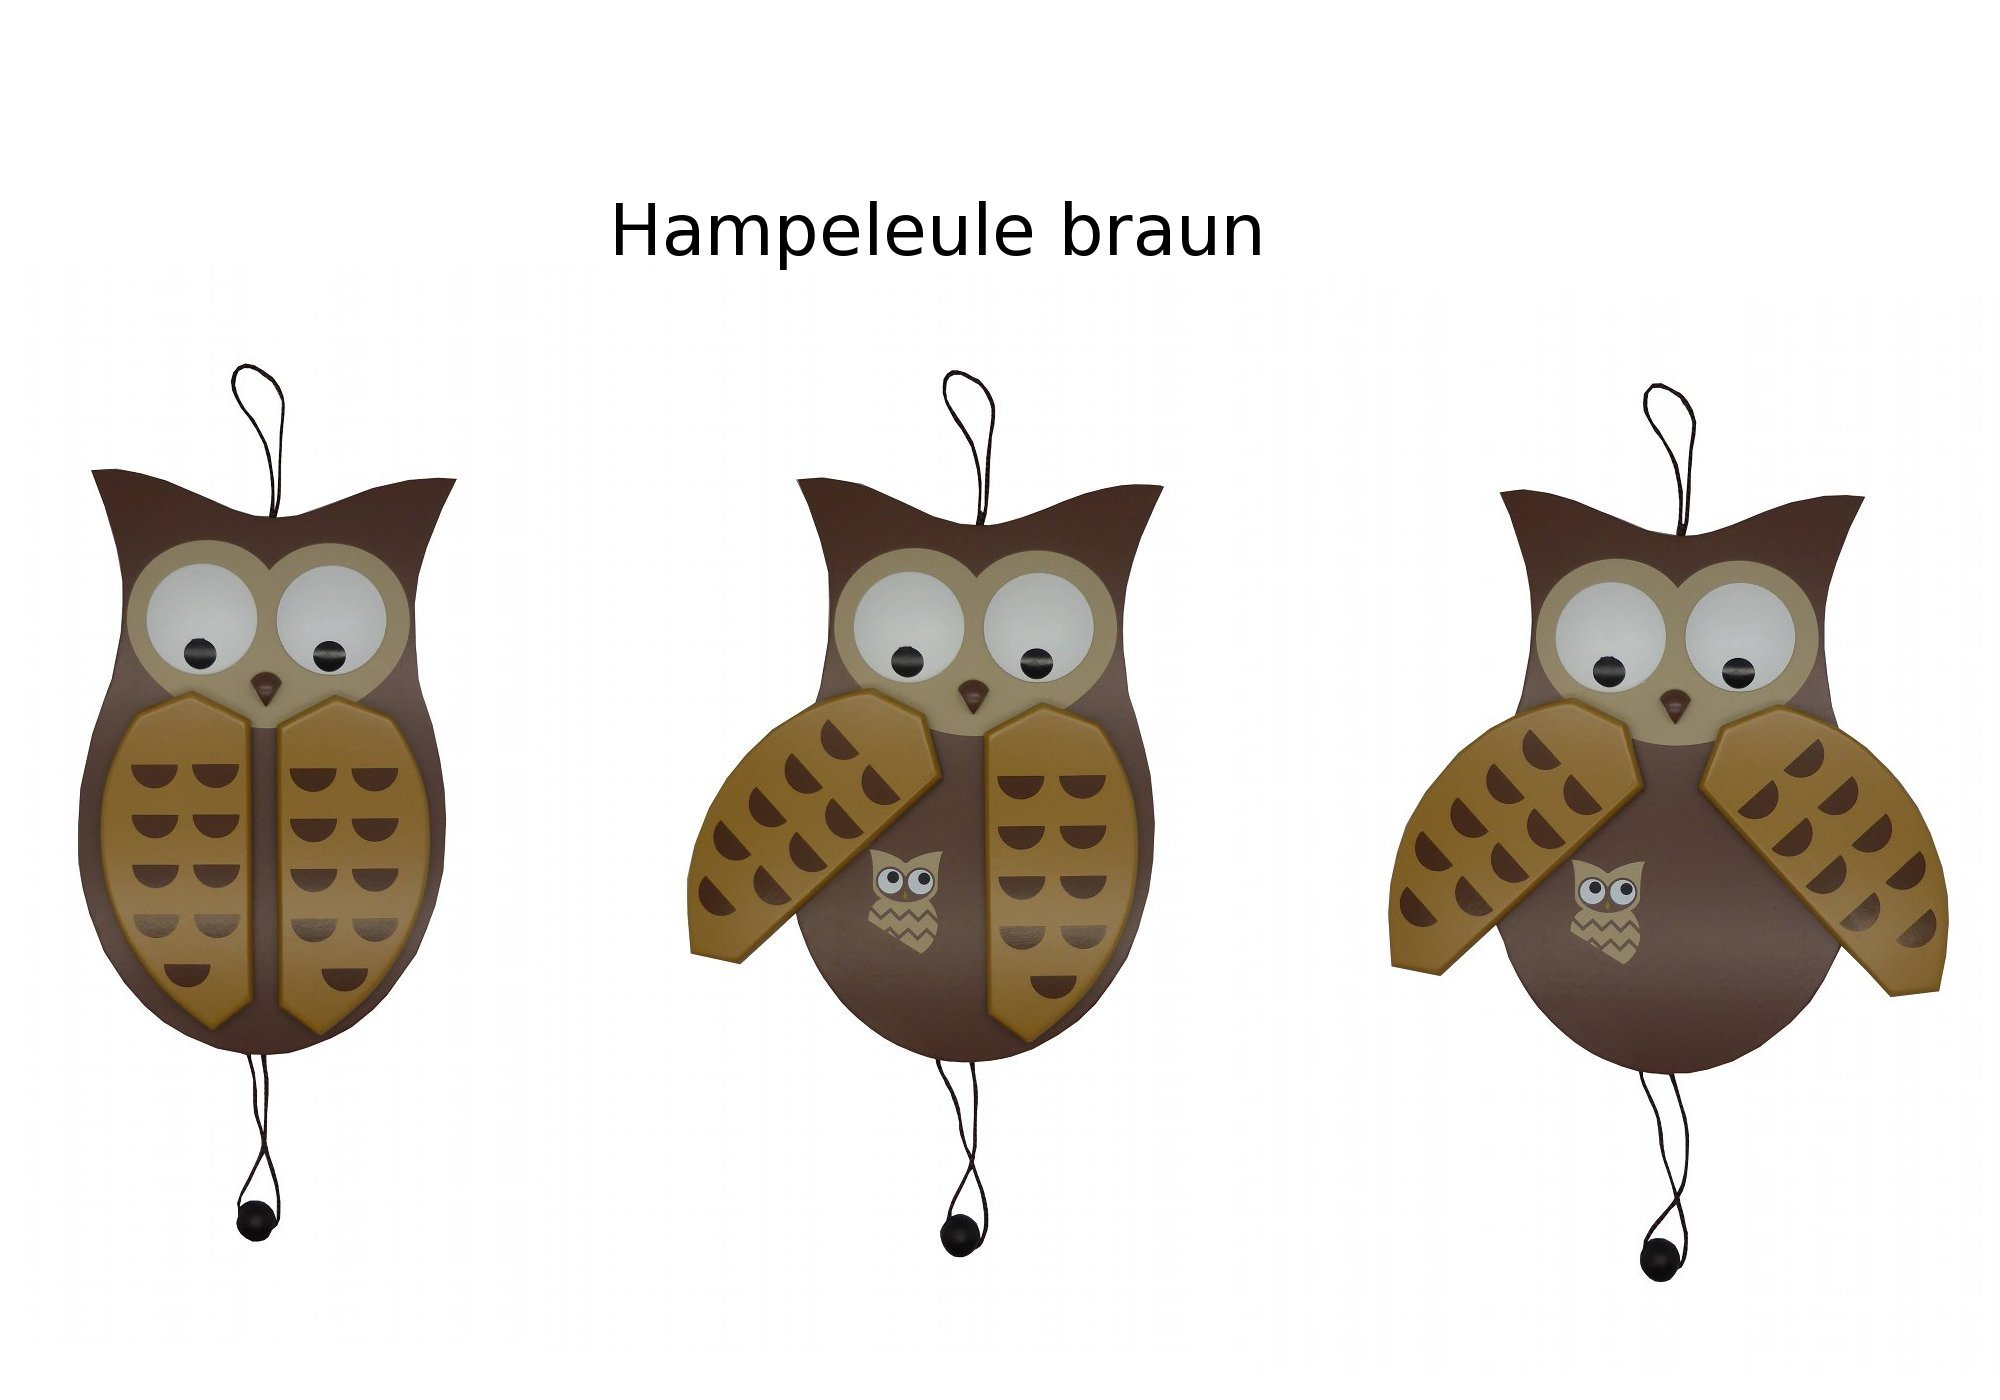 TomSaLand_Hampeleule_braun_Gruppefoto